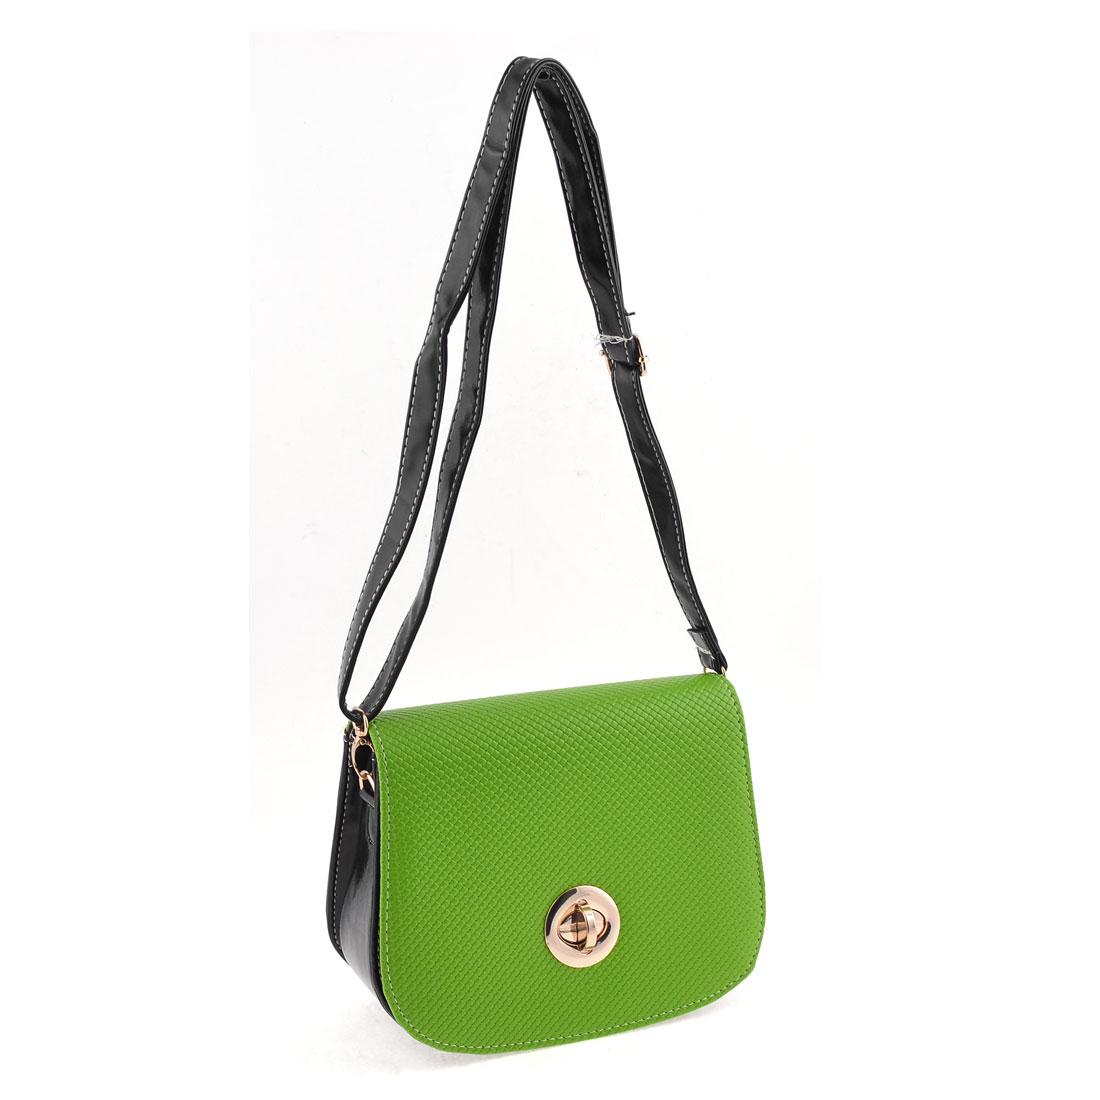 Women Retro Style Alligator Pattern Faux Leather Shoulder Bag Handbag Black Green